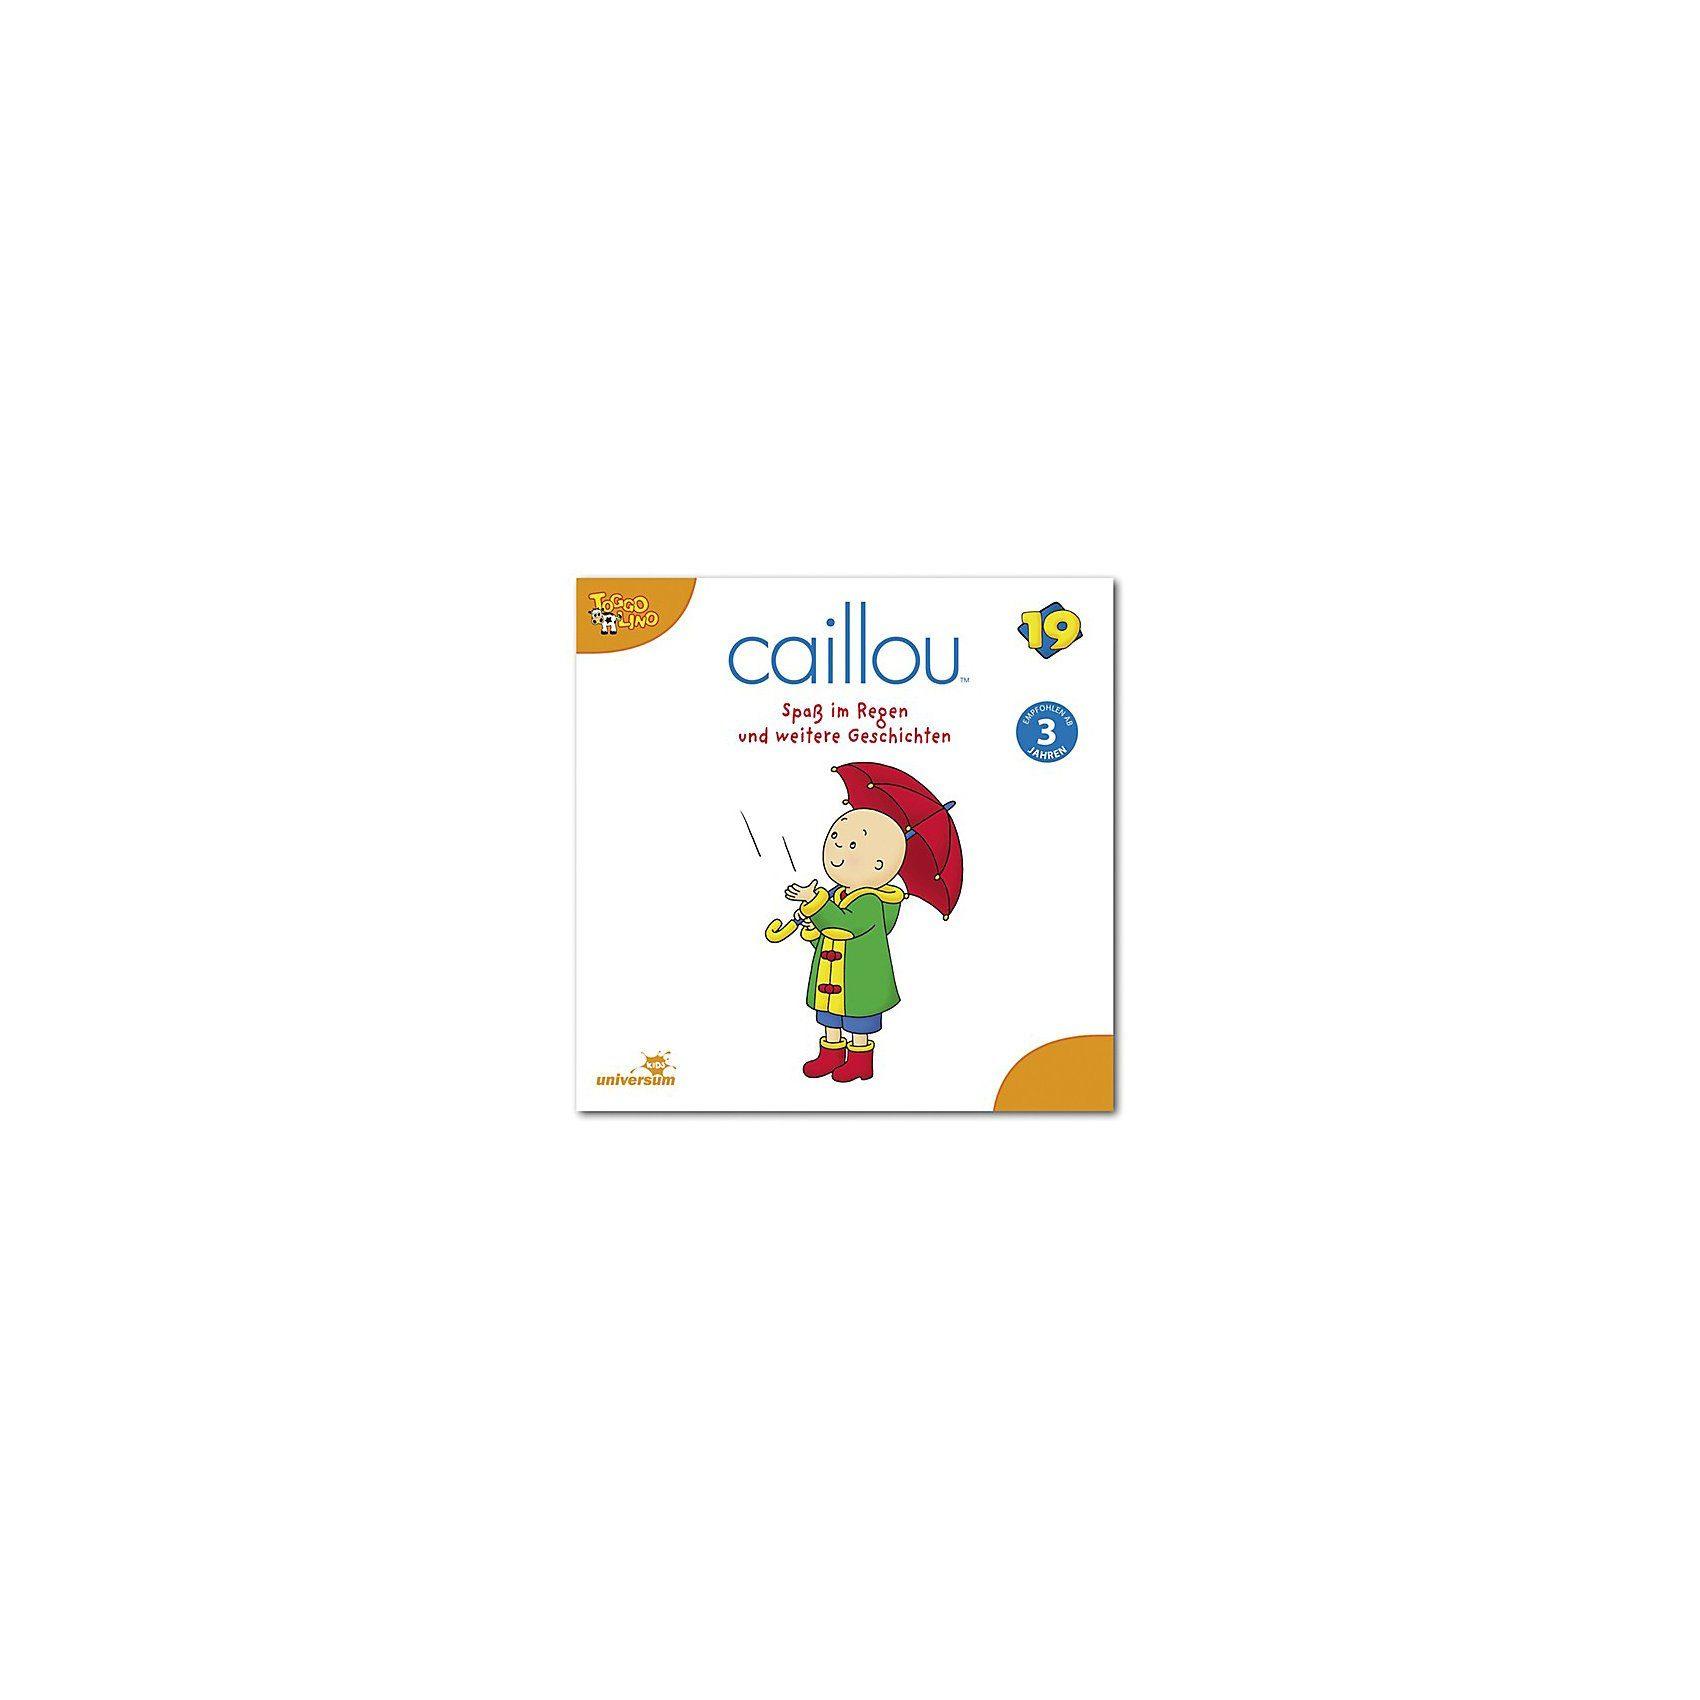 SONY BMG MUSIC CD Caillou 19 - Spaß im Regen